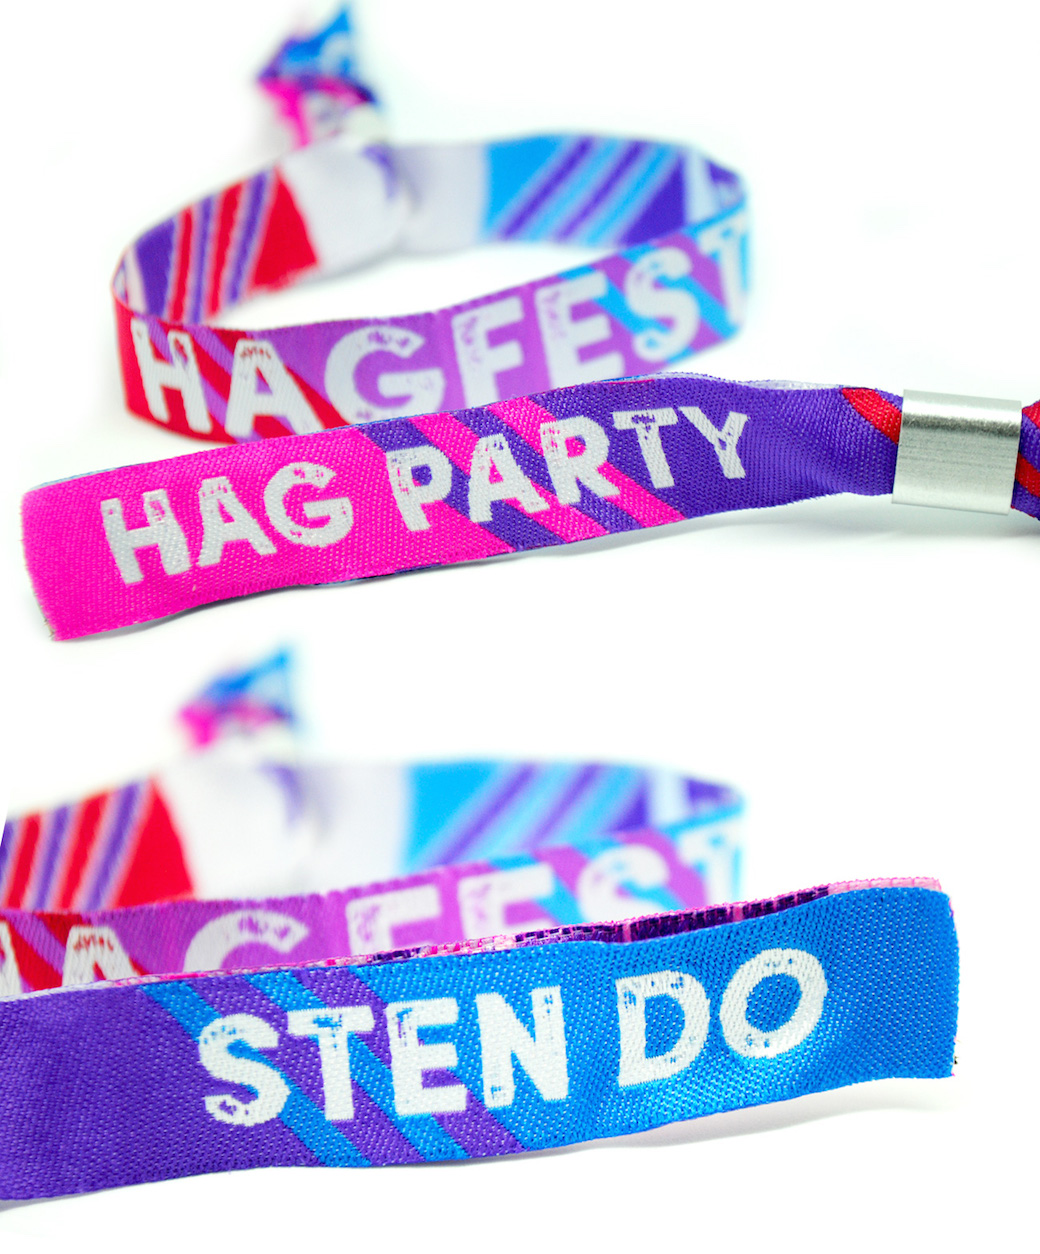 hag party sten do hagfest wristband accessories